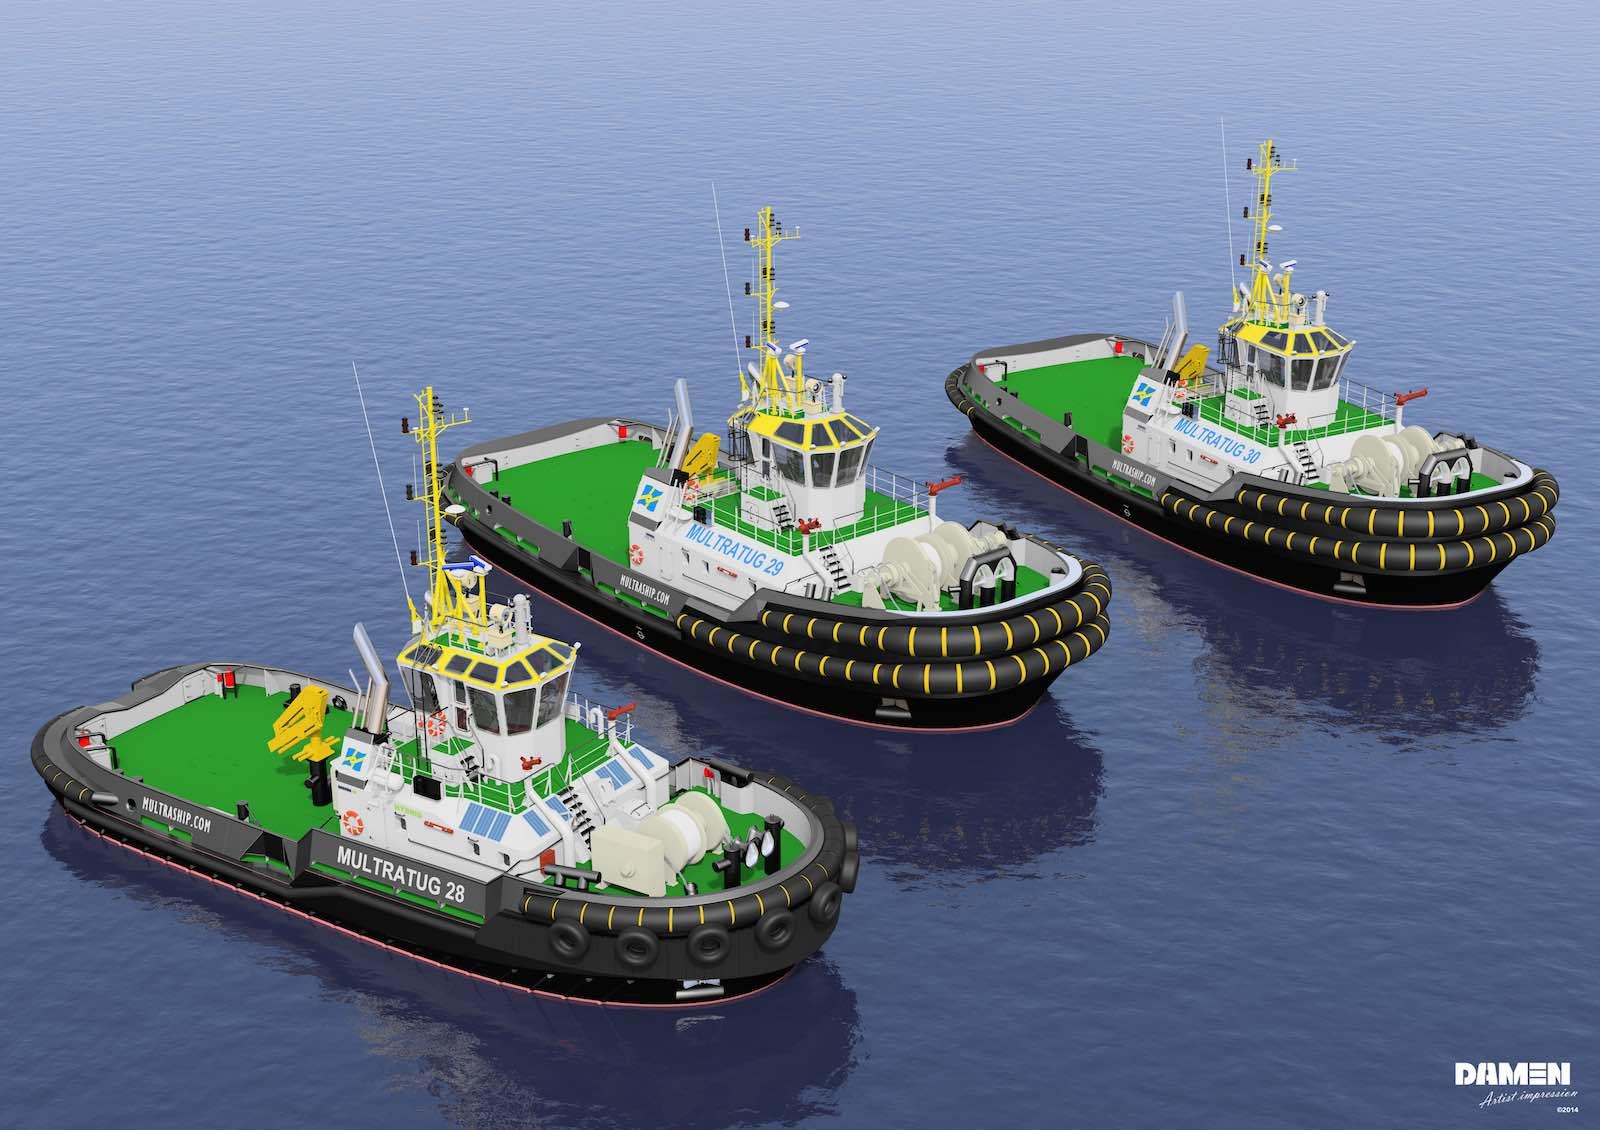 Multraship and Damen agree deals for three more ASD Tugs